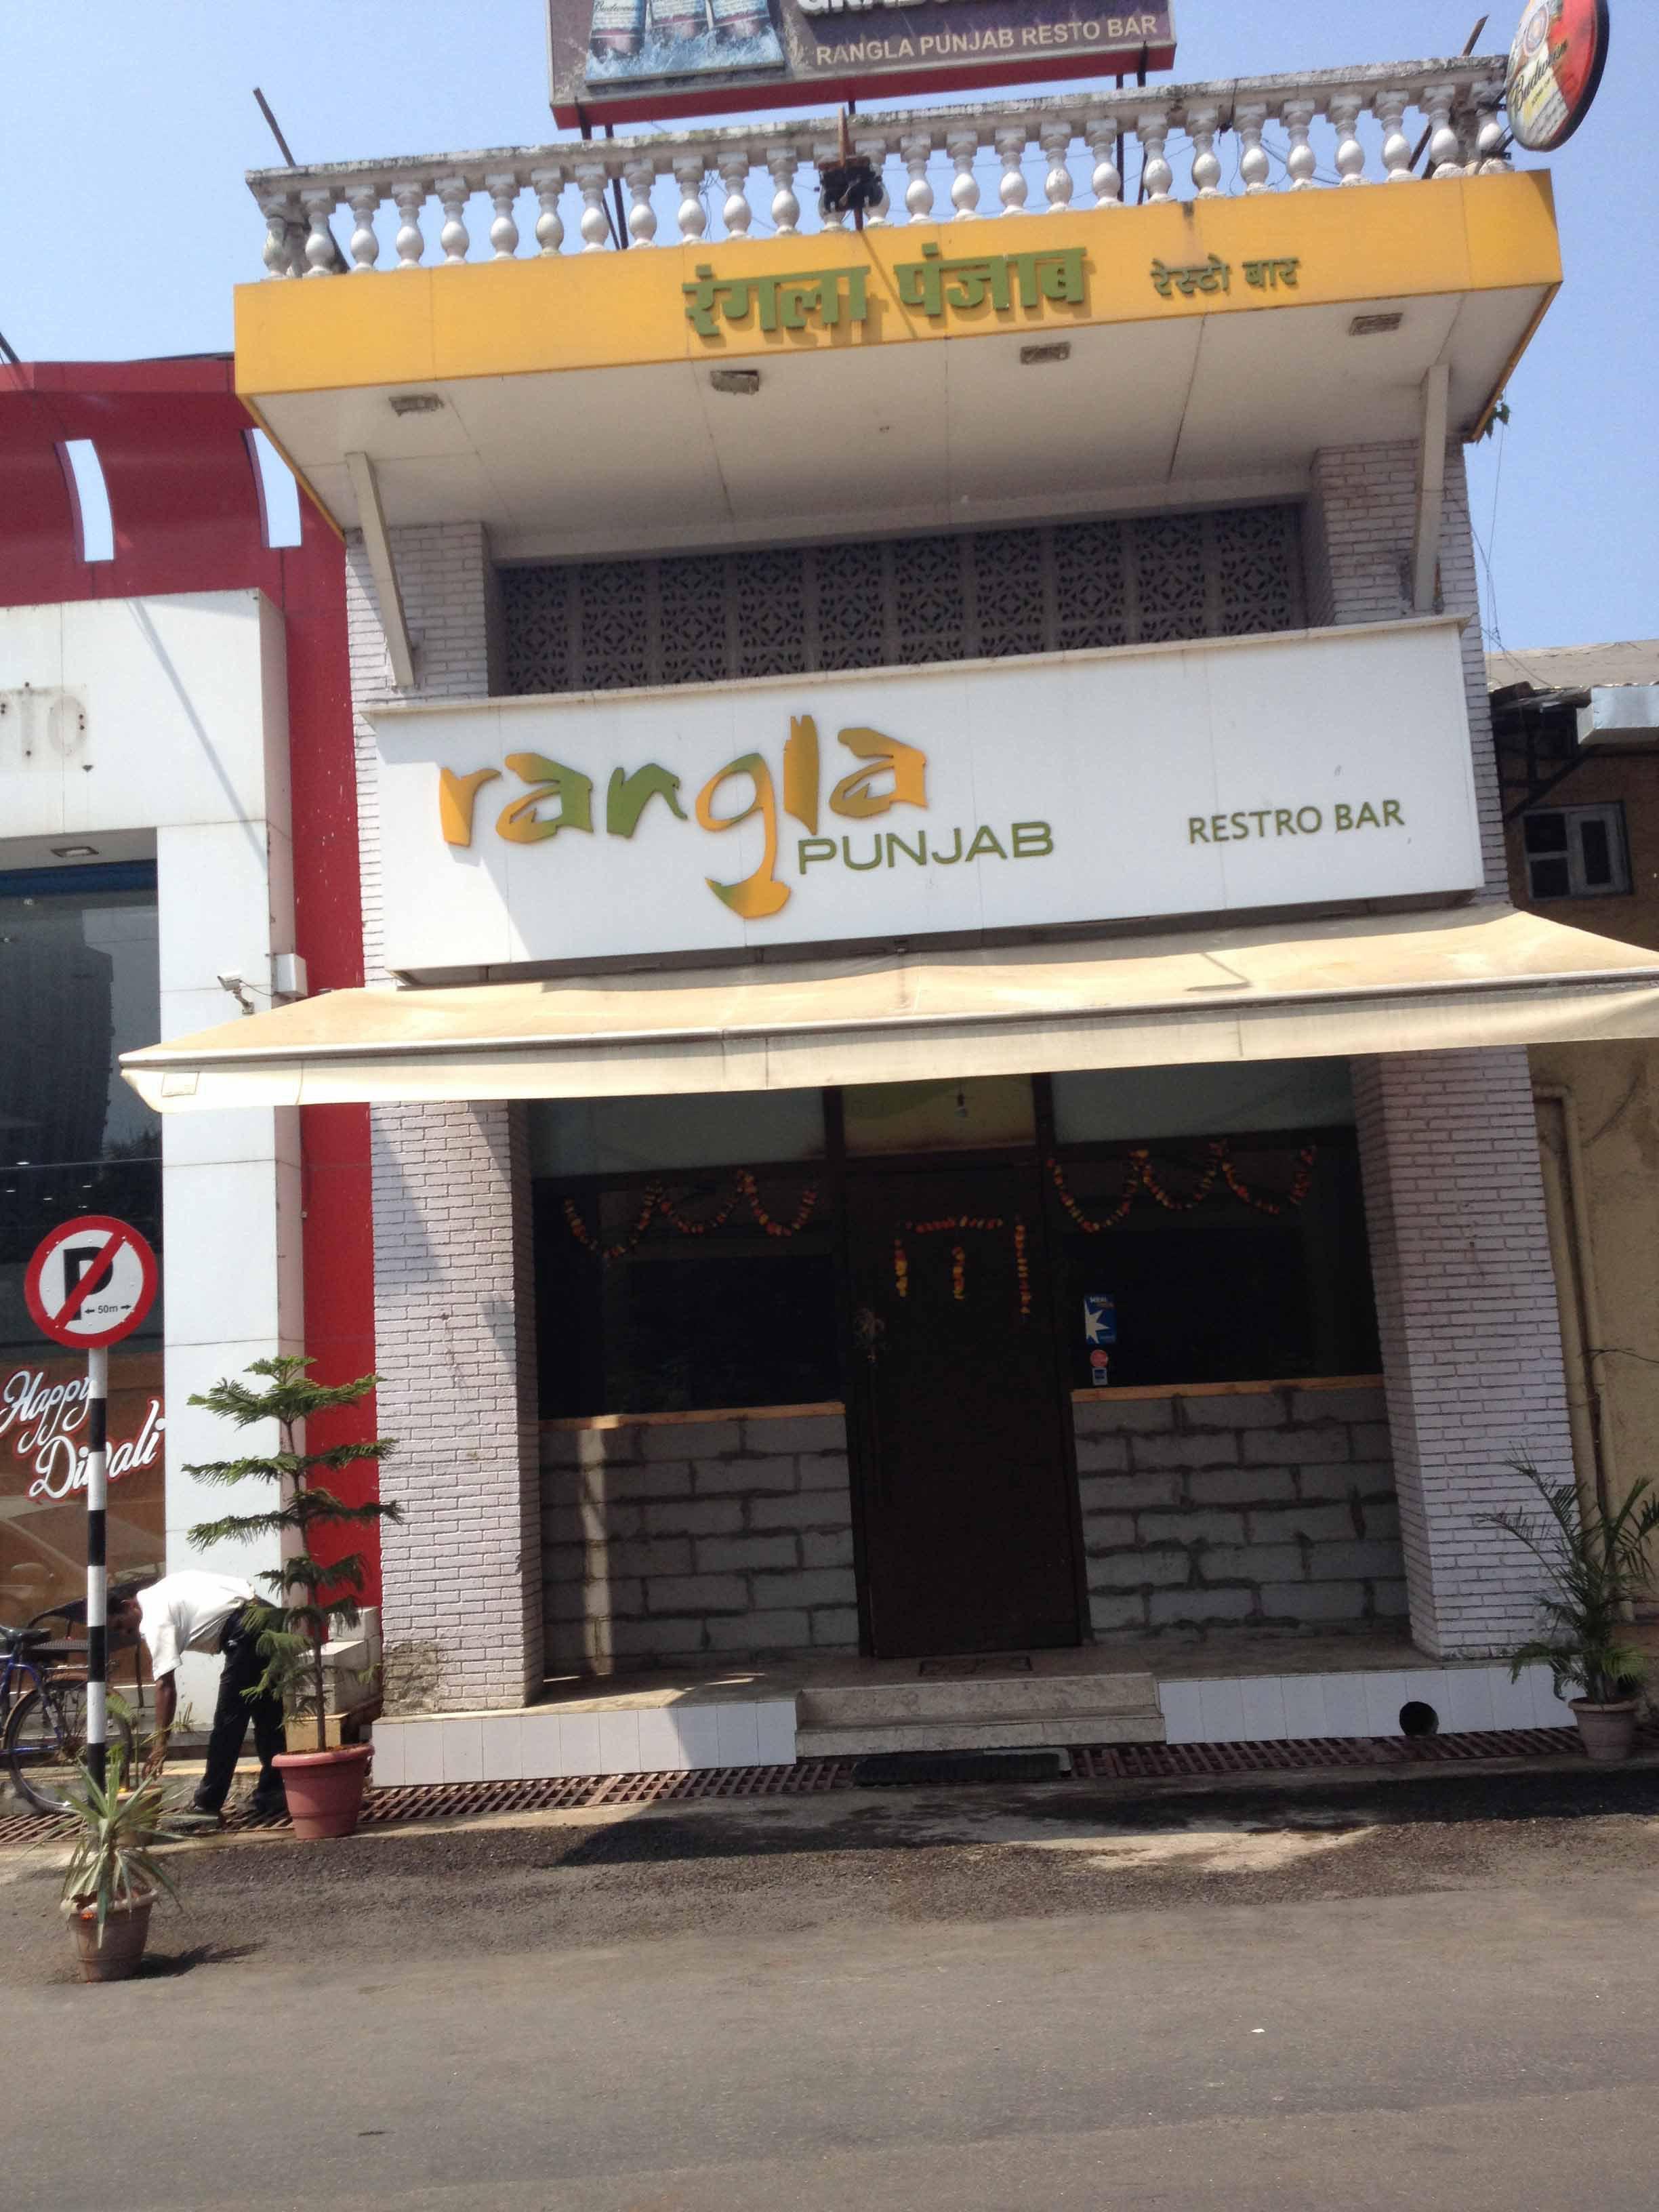 Rangla Punjab - Manpada - Thane Image